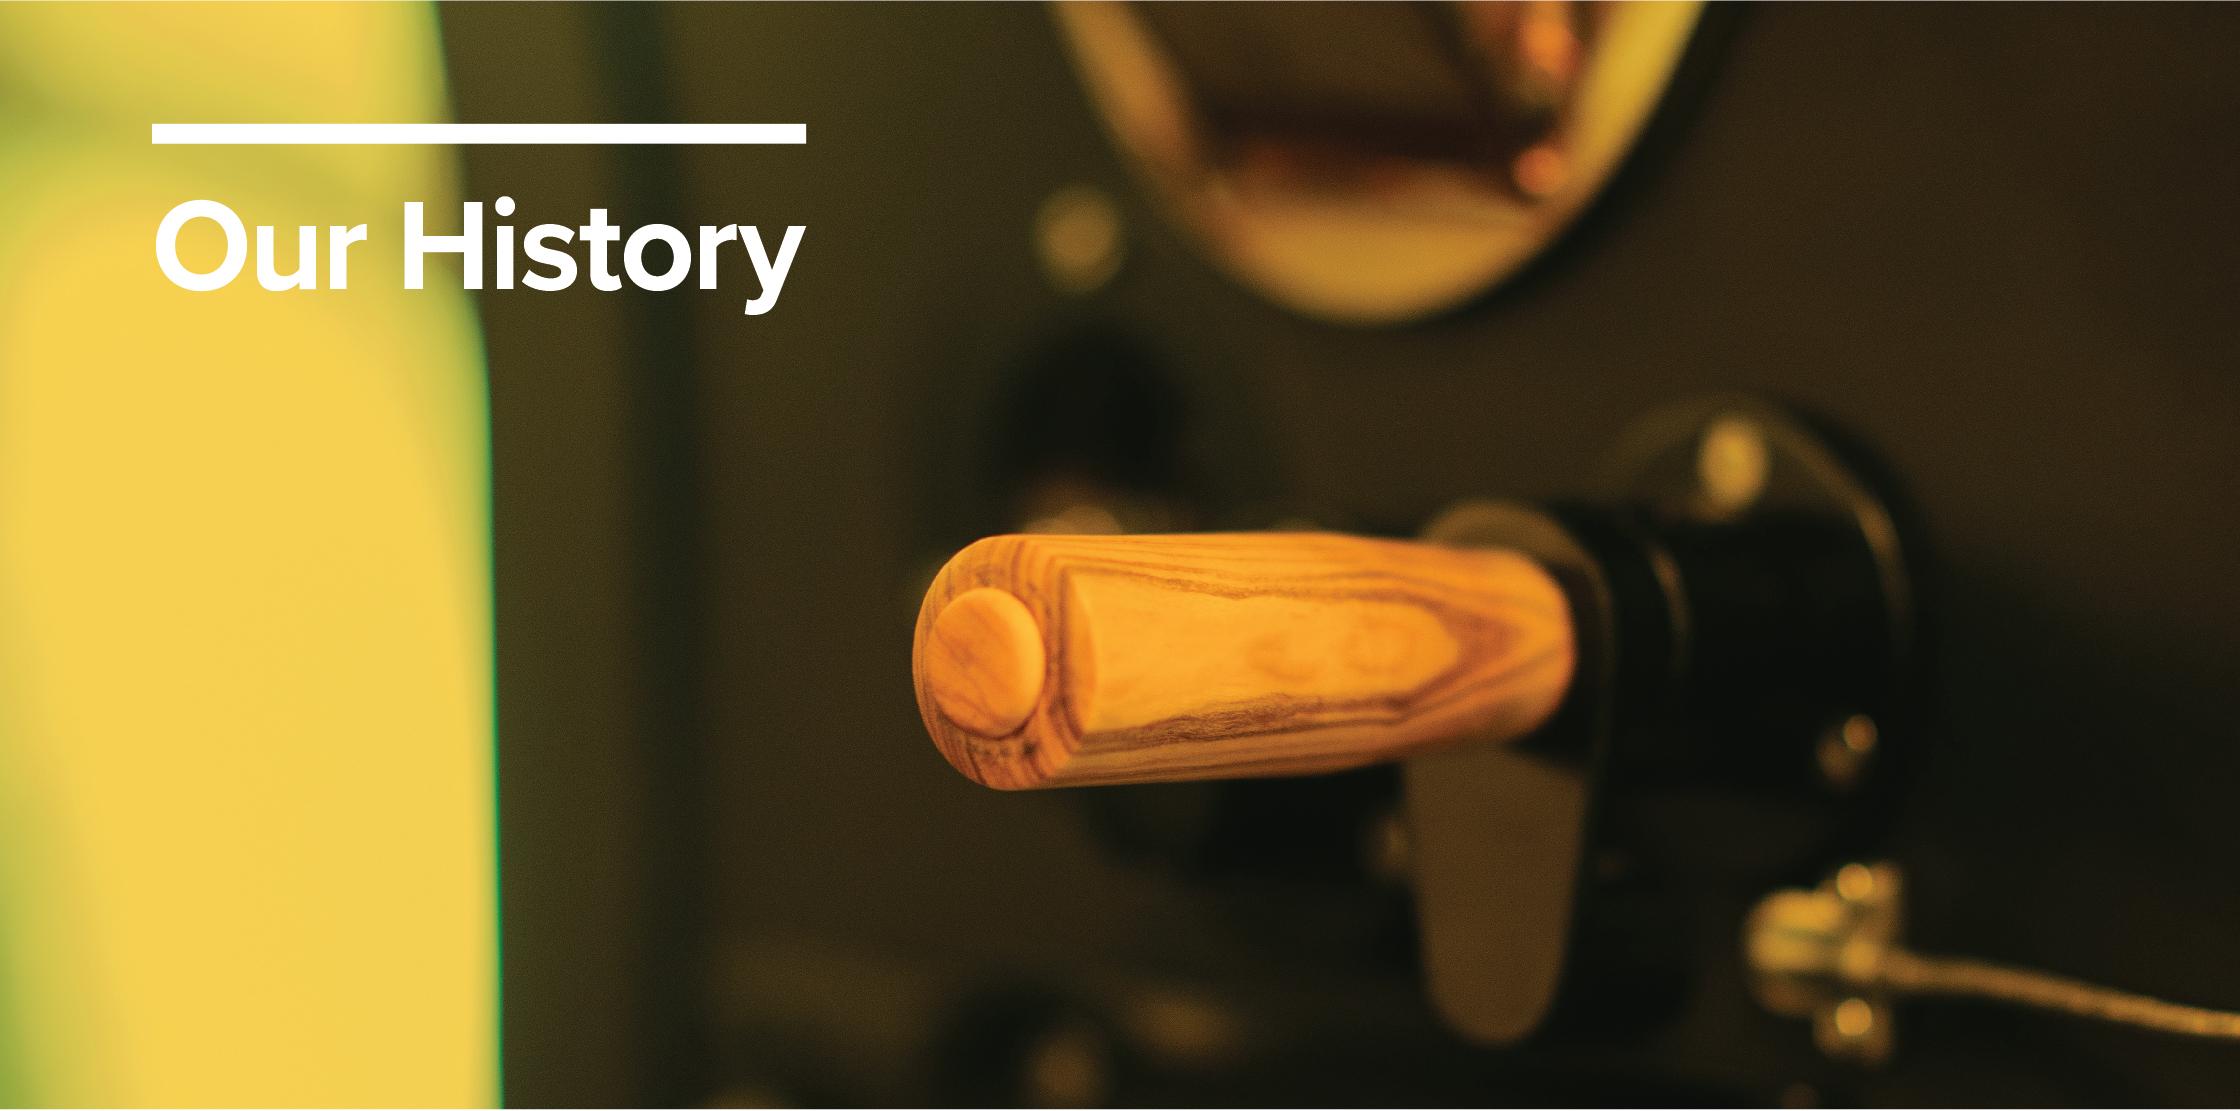 crg_our_history.jpg